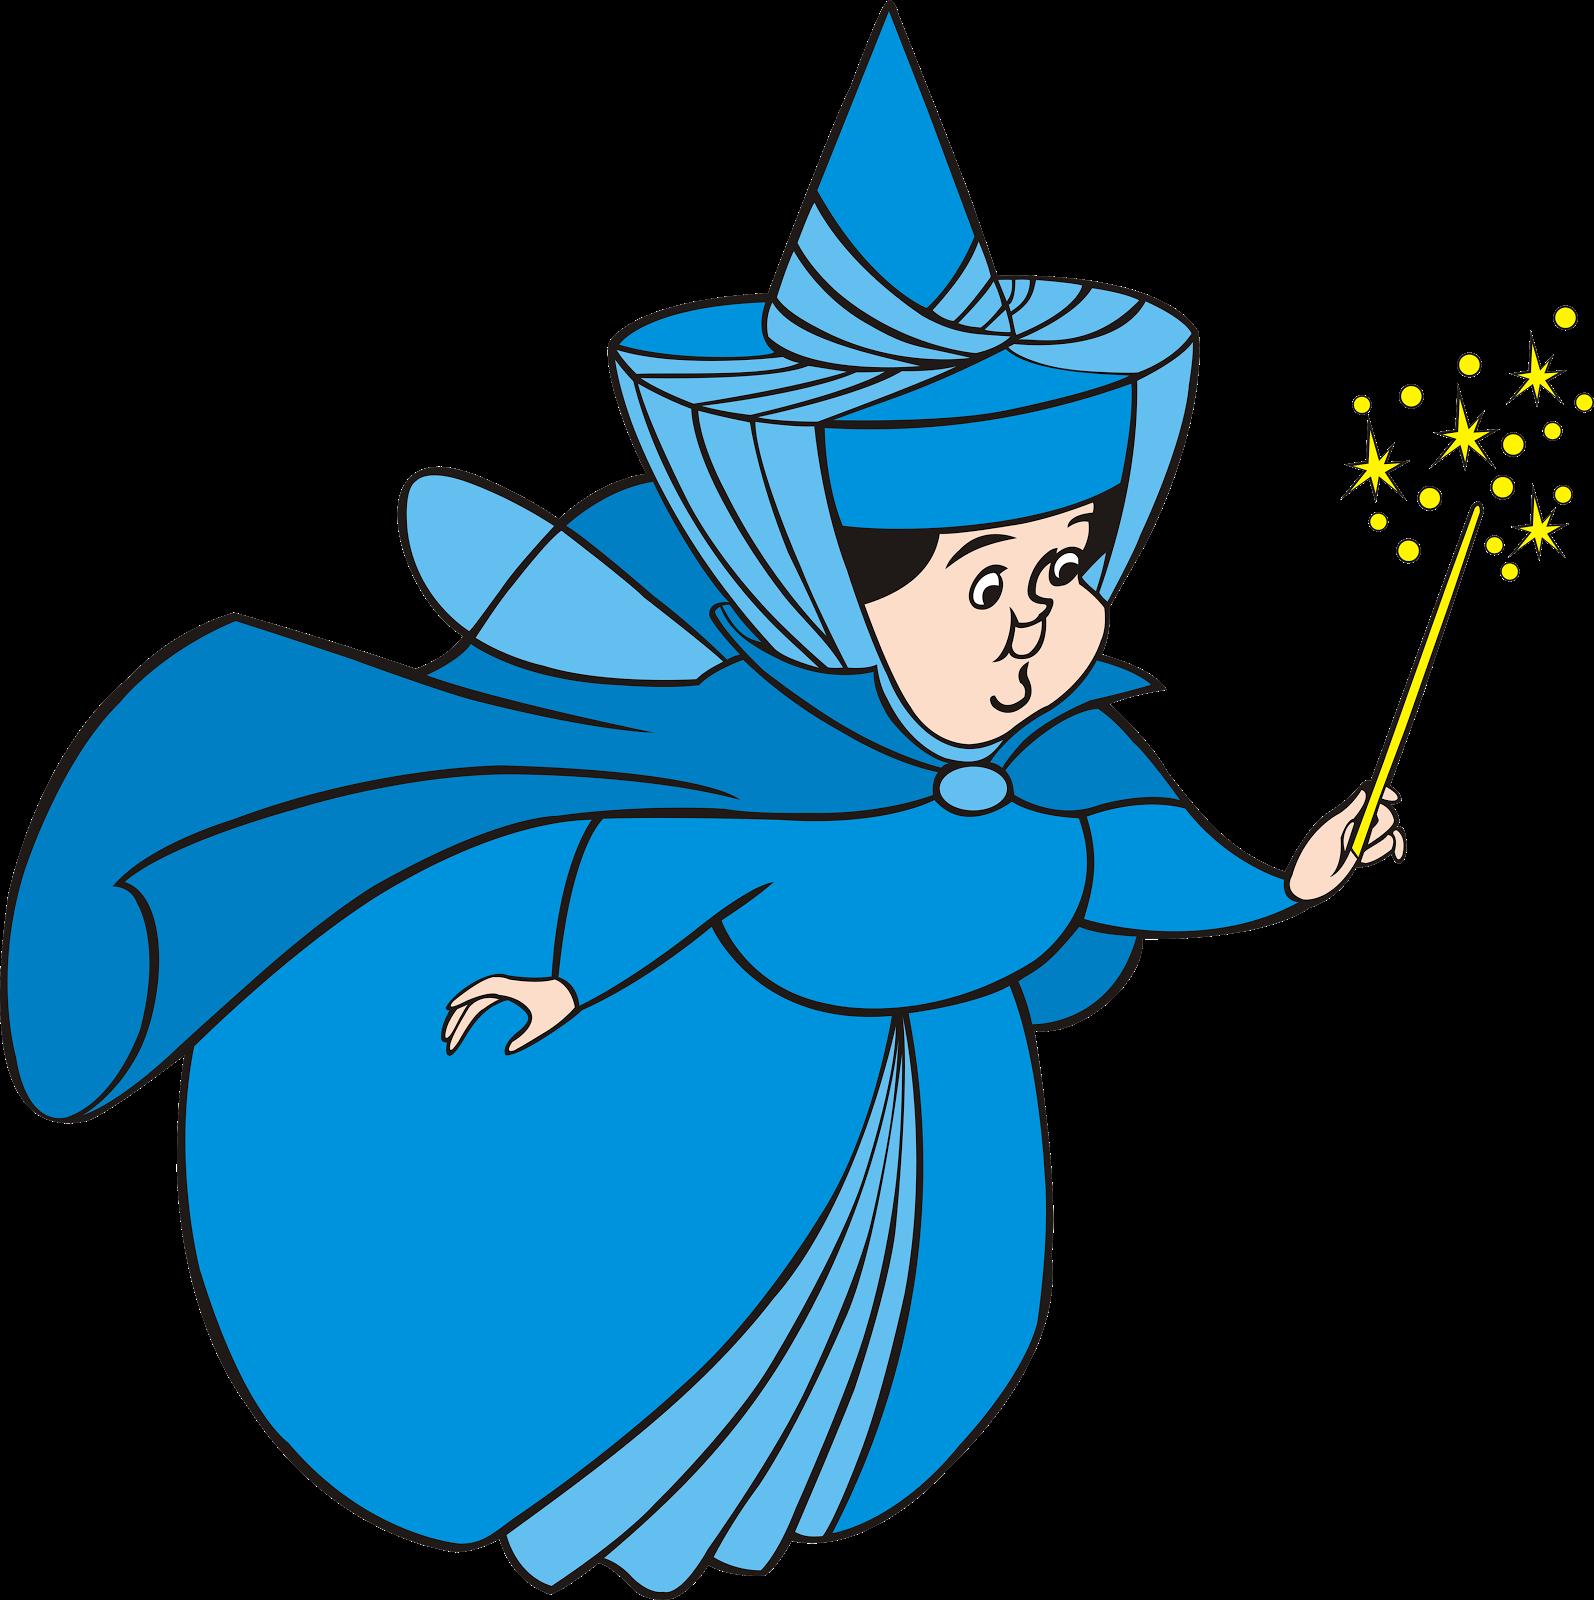 Princess aurora flora fauna. Fairy clipart hat